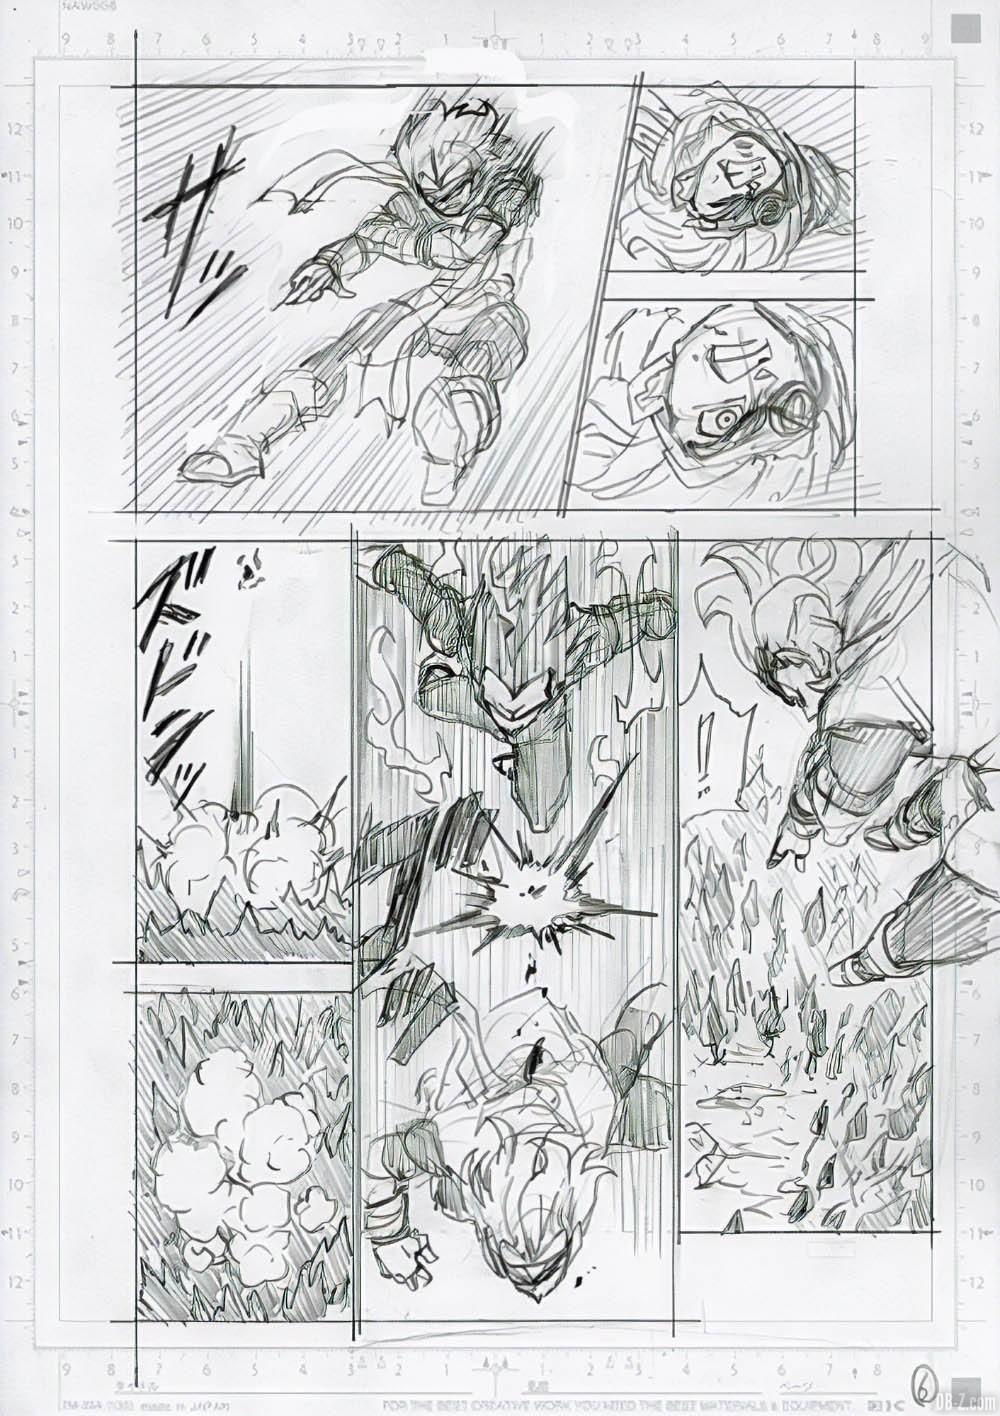 Dragon-Ball-Super-Chapitre-75-Brouillon-6-4x Manga109Attempt